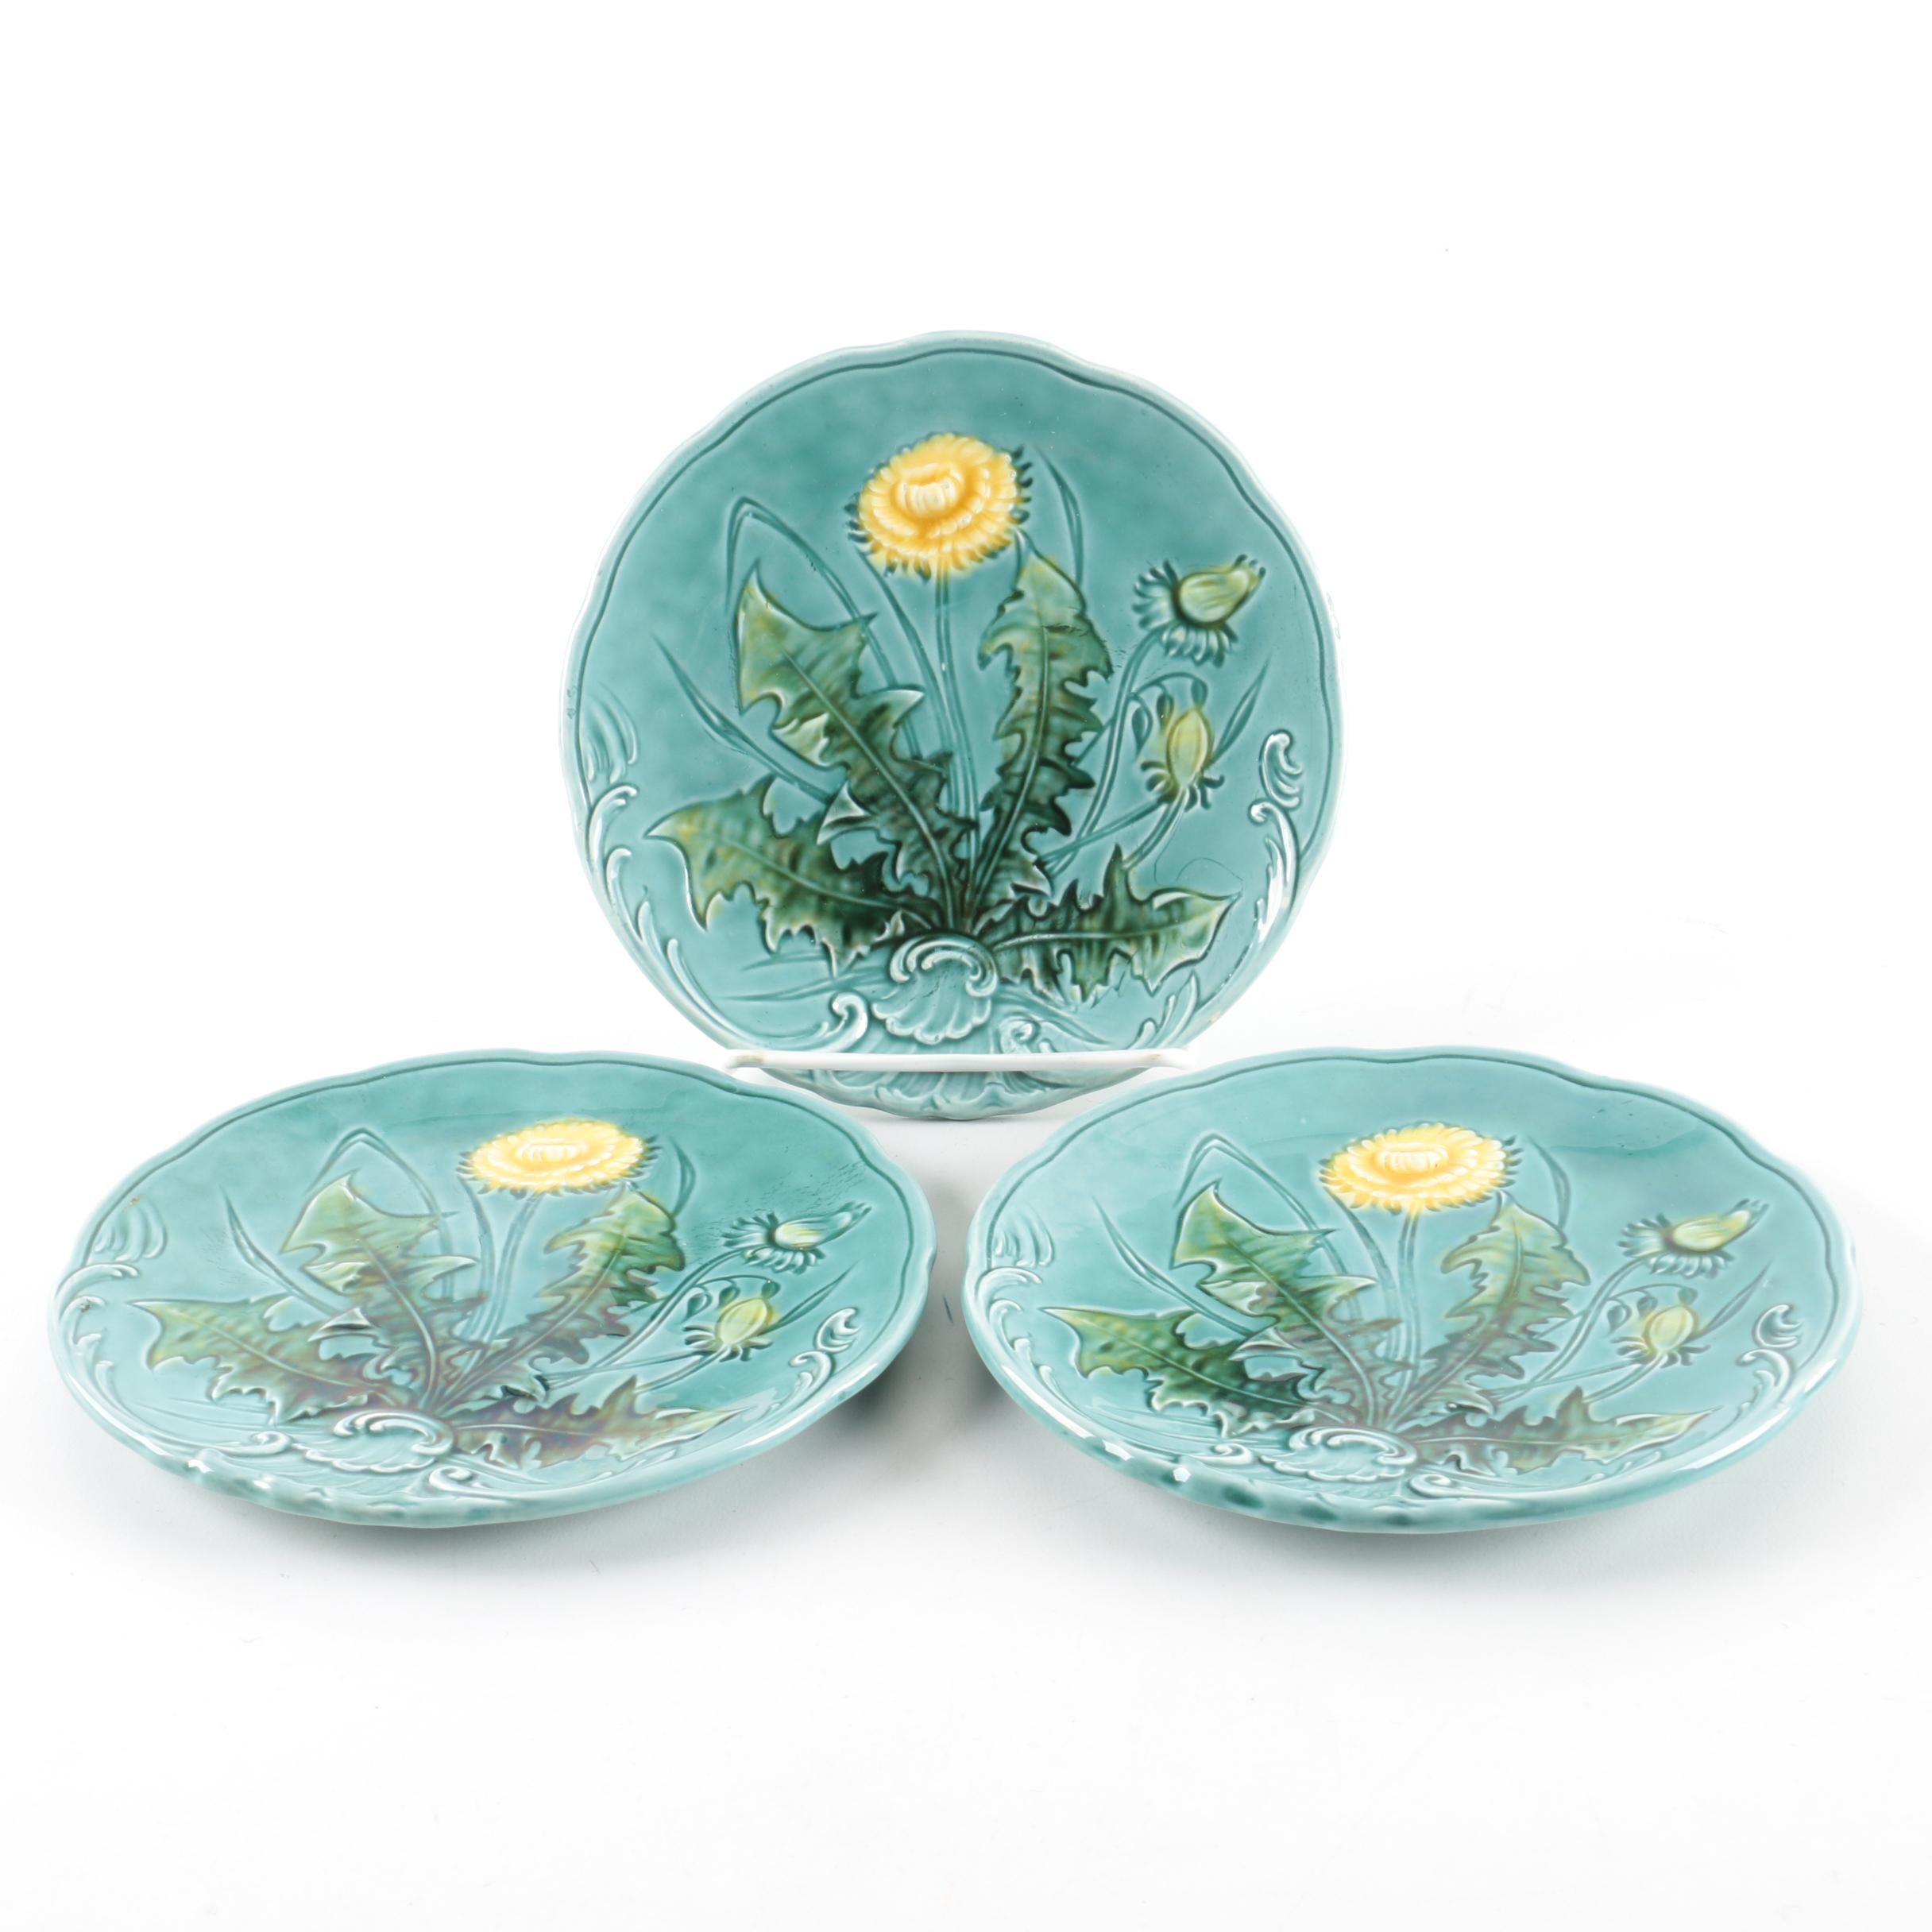 Vintage Baden G. S. Zell Turquoise Dandelion Majolica Plates